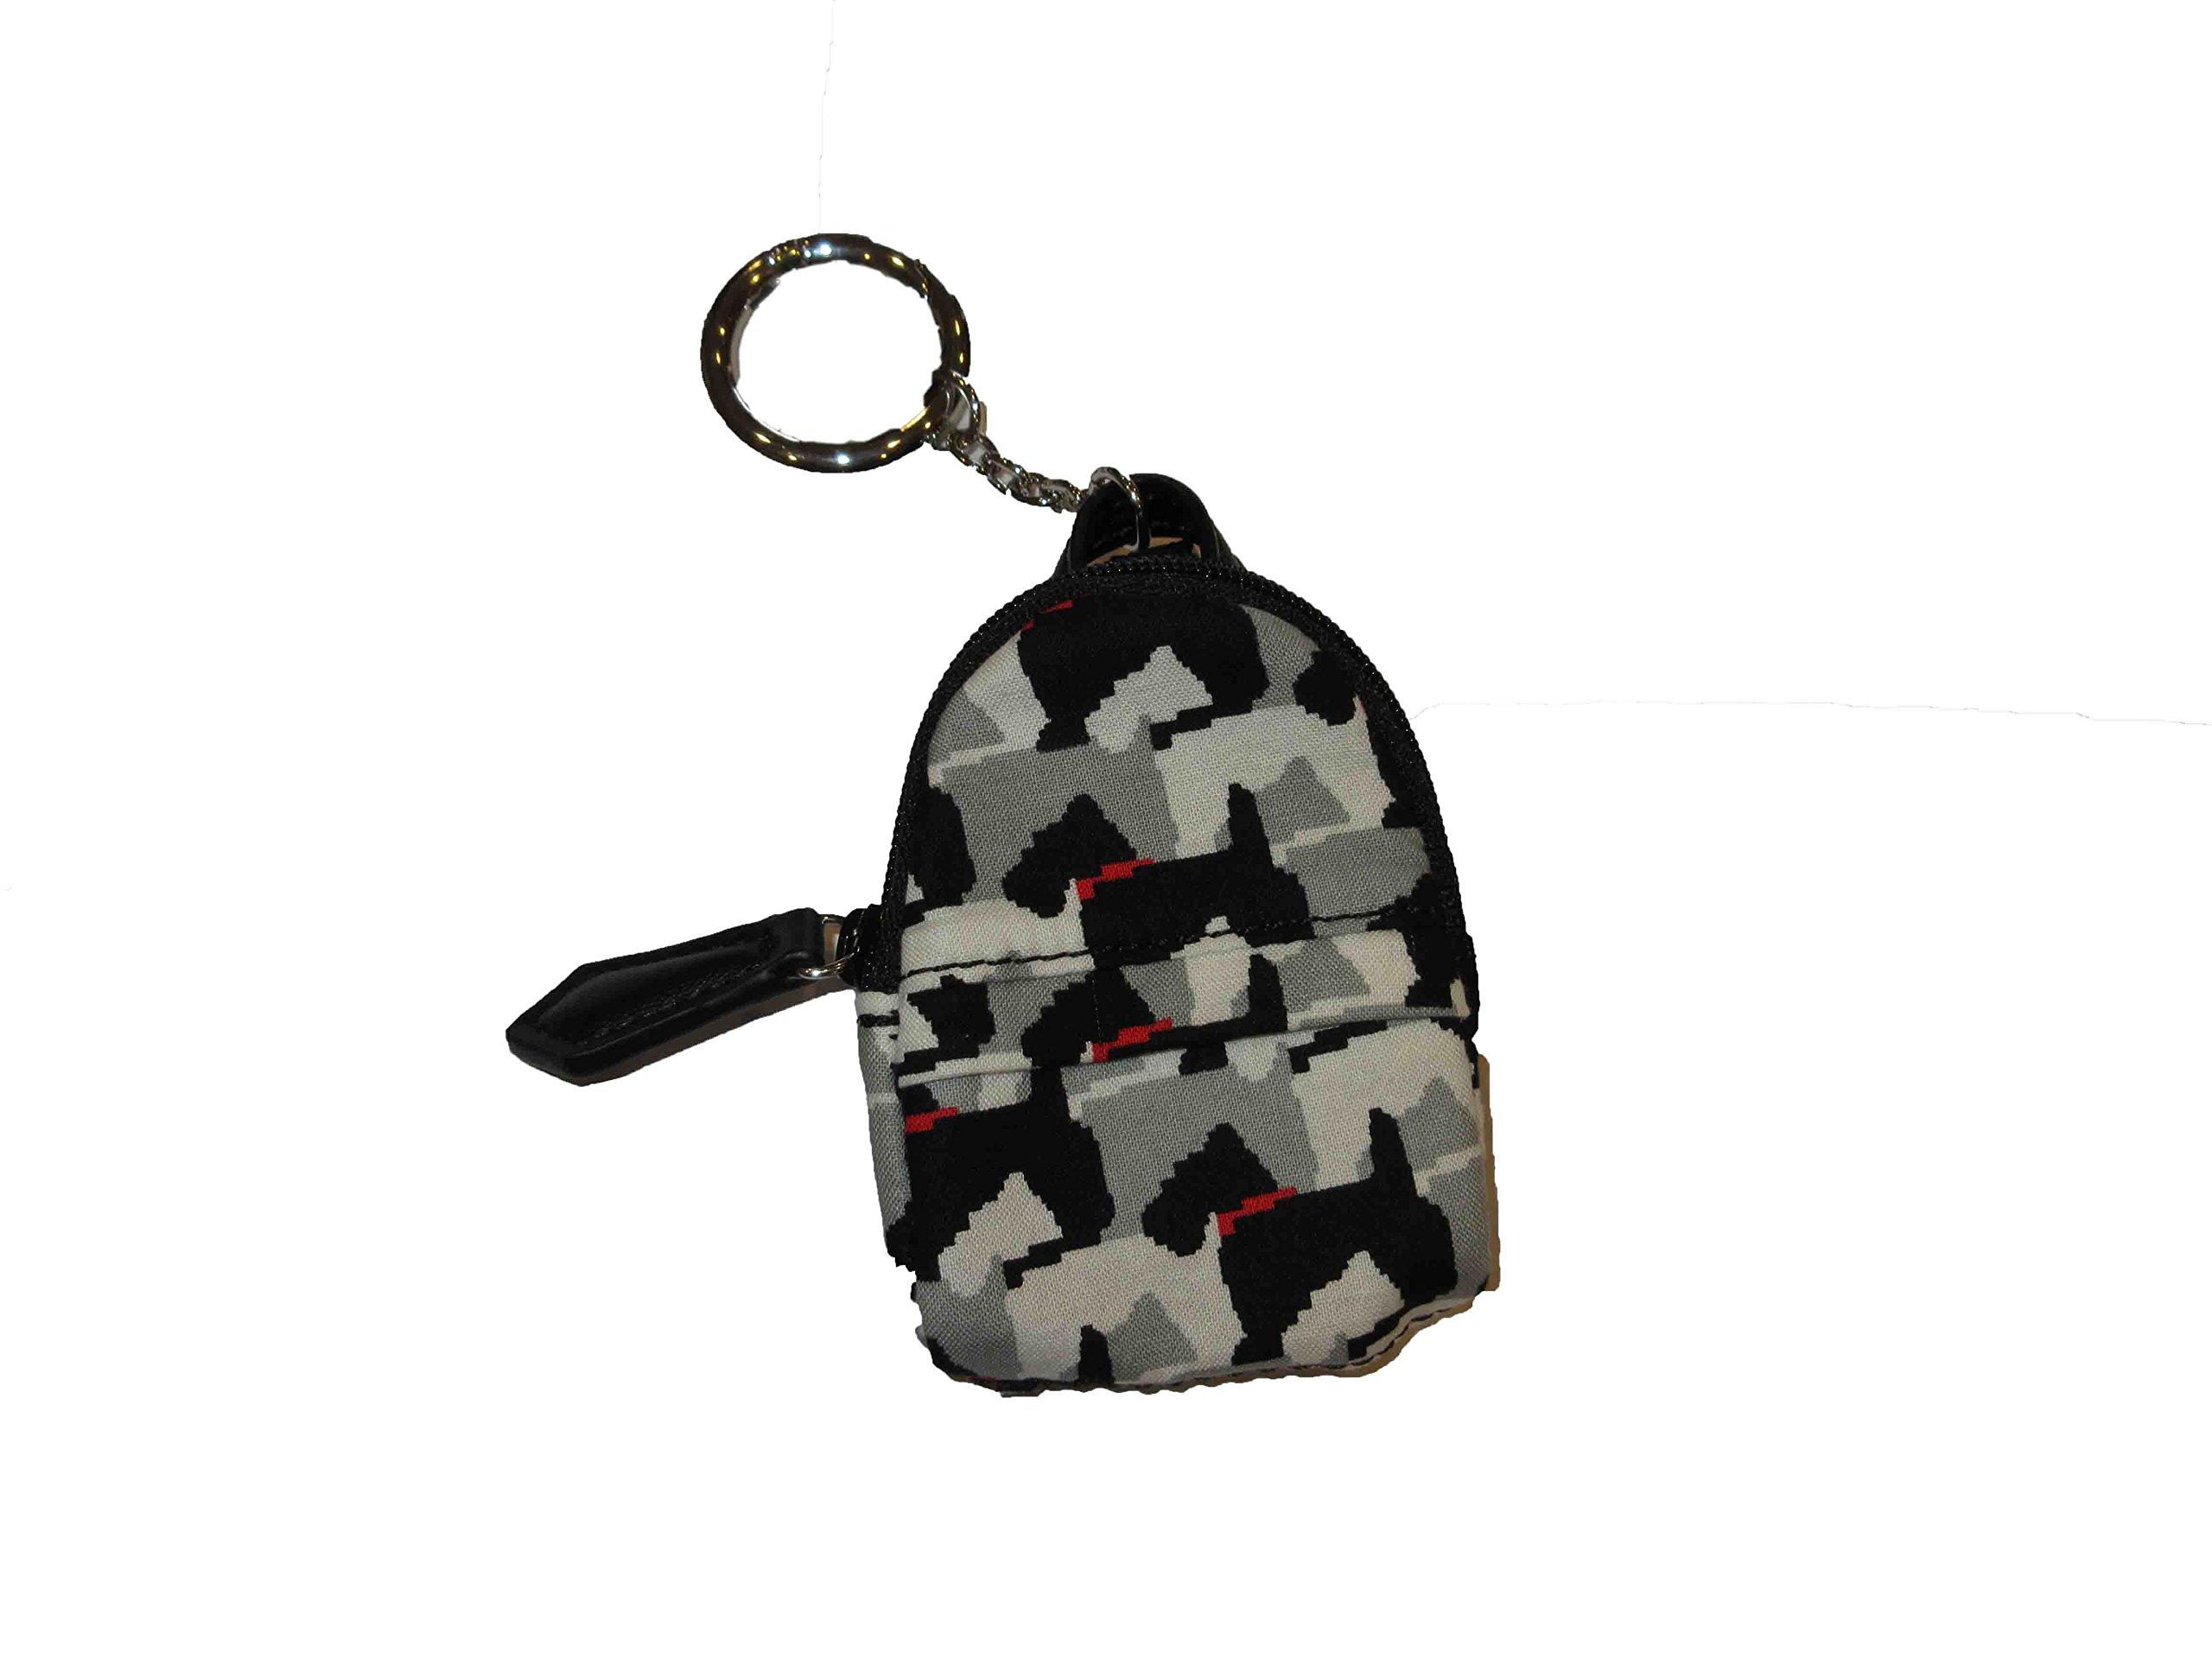 Vera Bradley Micro Backpack Charm in Scottie Dogs